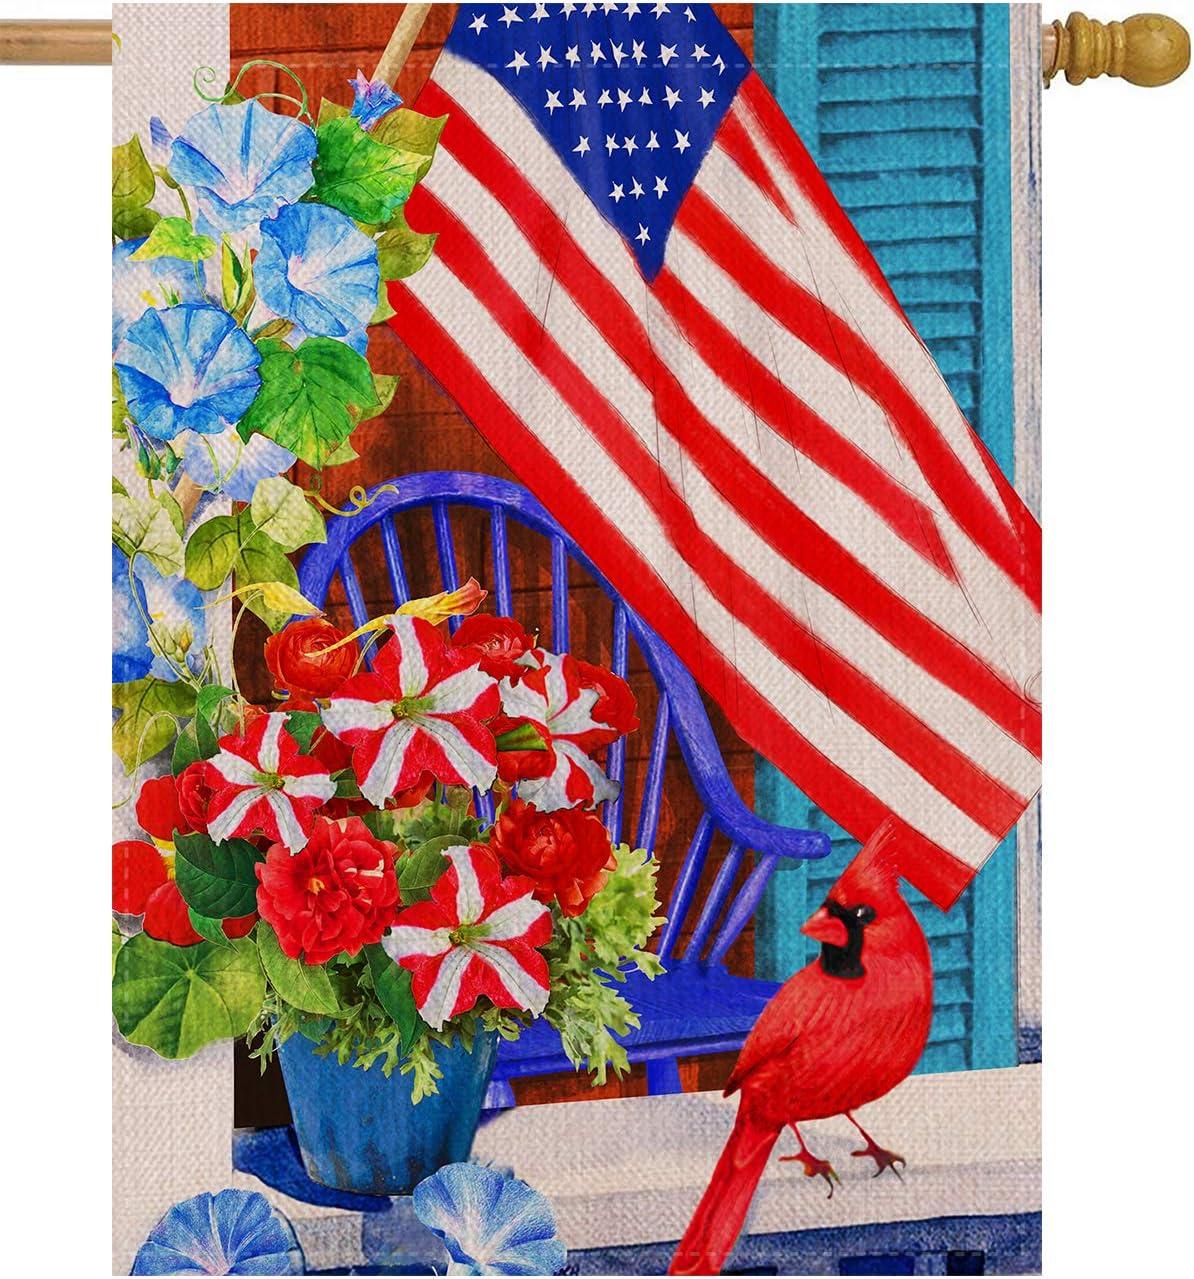 Dyrenson 4th Of July 28 X 40 House Flag Large Double Sided Patriotic Cardinal Flower July 4 Red Bird Geraniums Burlap Garden Yard Decoration Spring Summer Usa Decorative Seasonal Outdoor